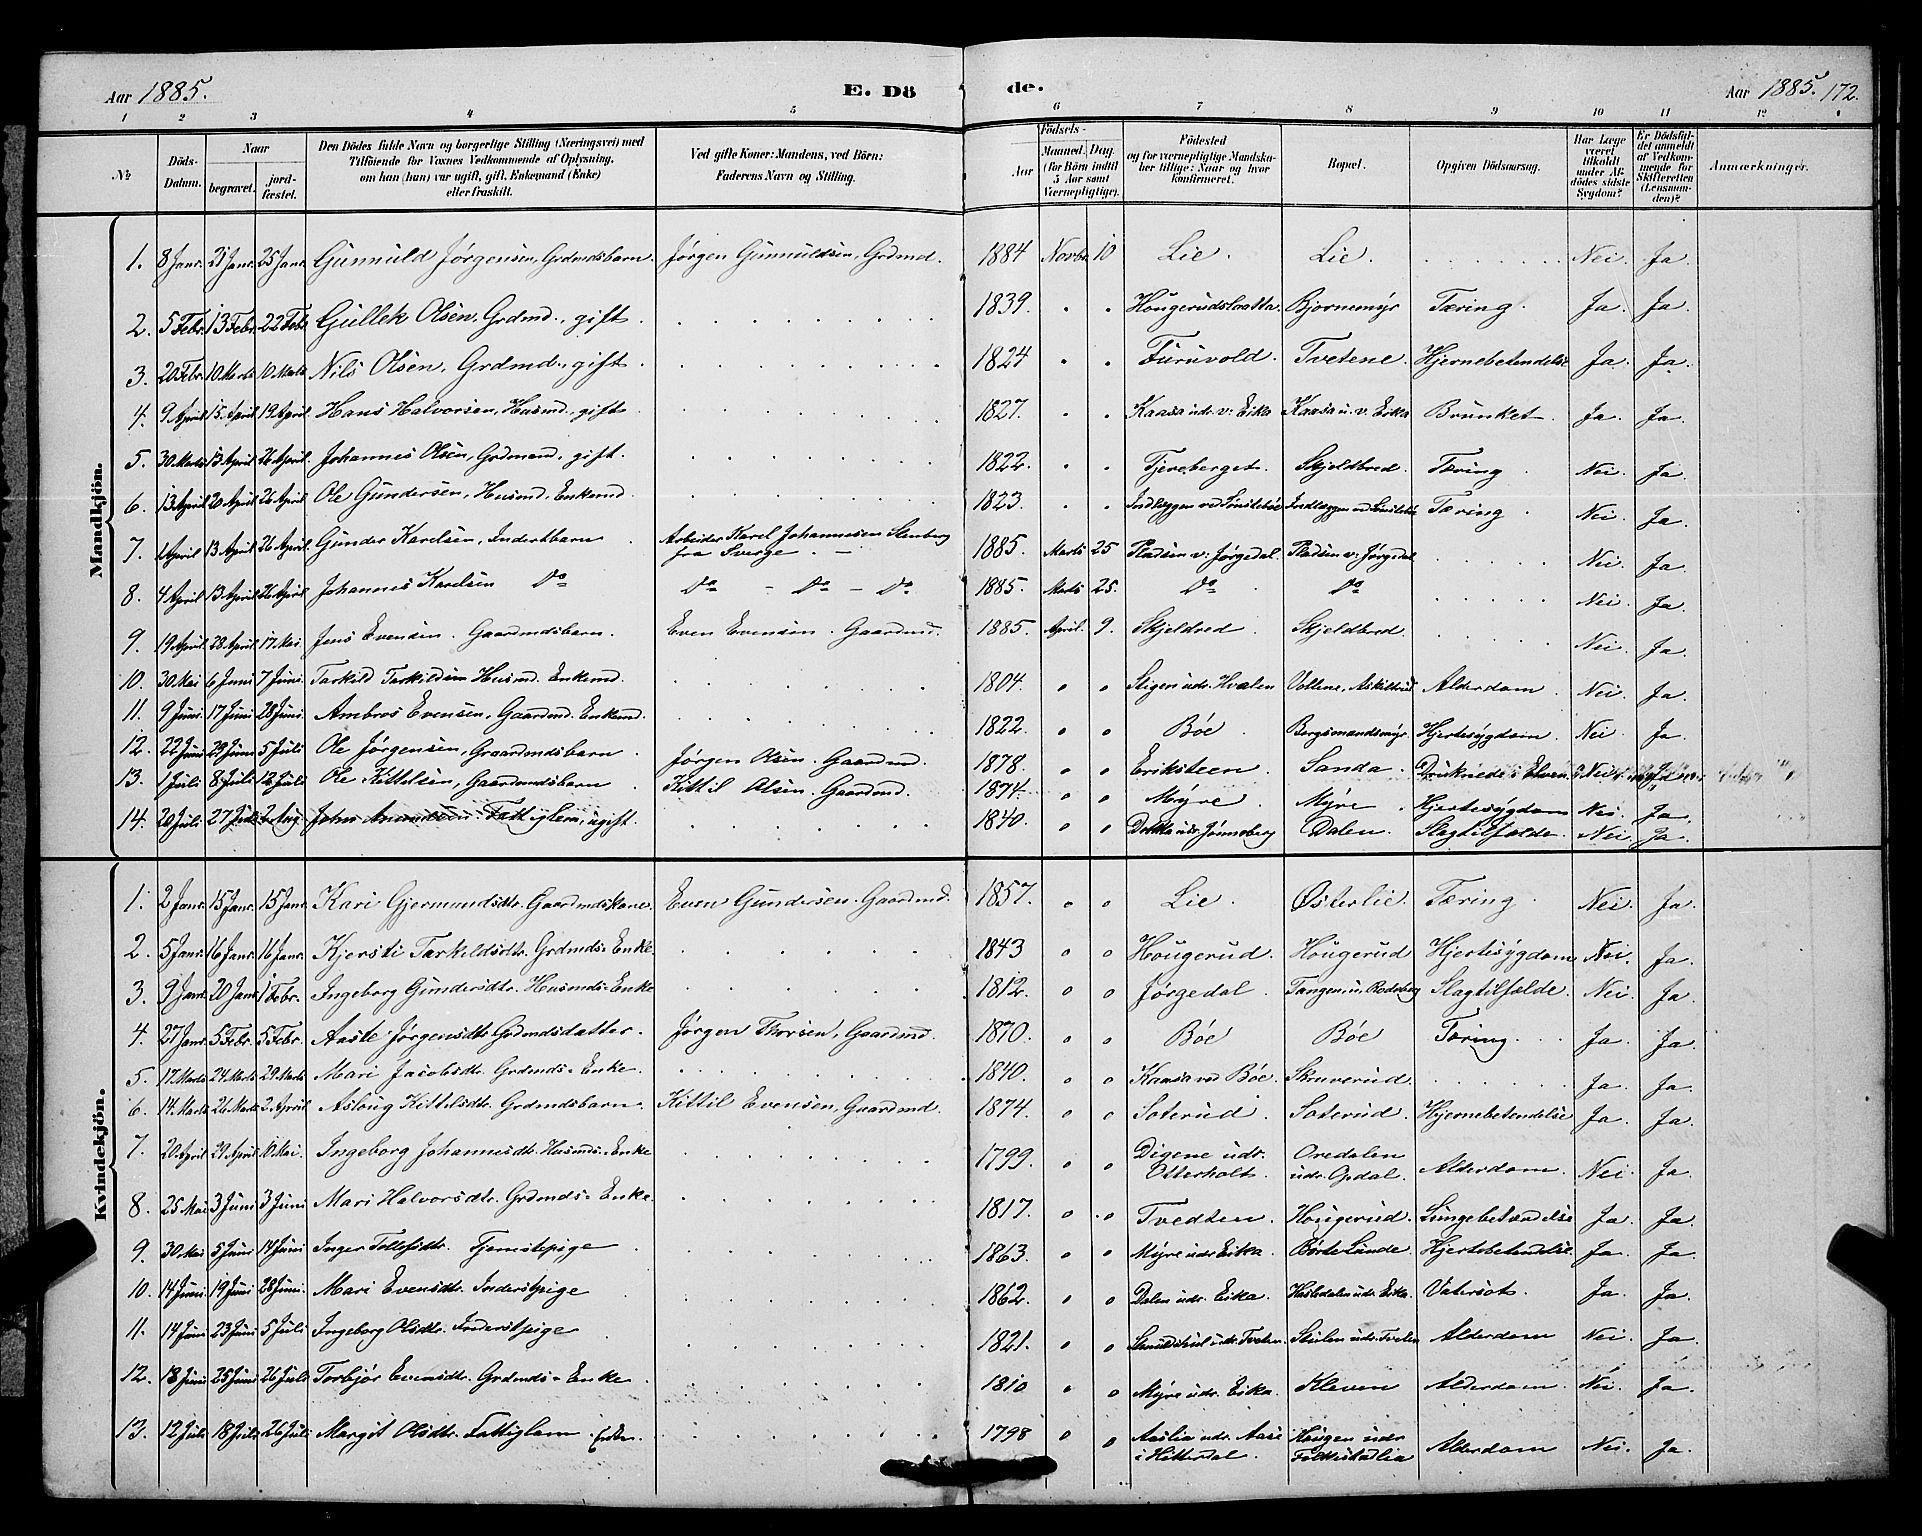 SAKO, Bø kirkebøker, G/Ga/L0005: Klokkerbok nr. 5, 1883-1897, s. 172